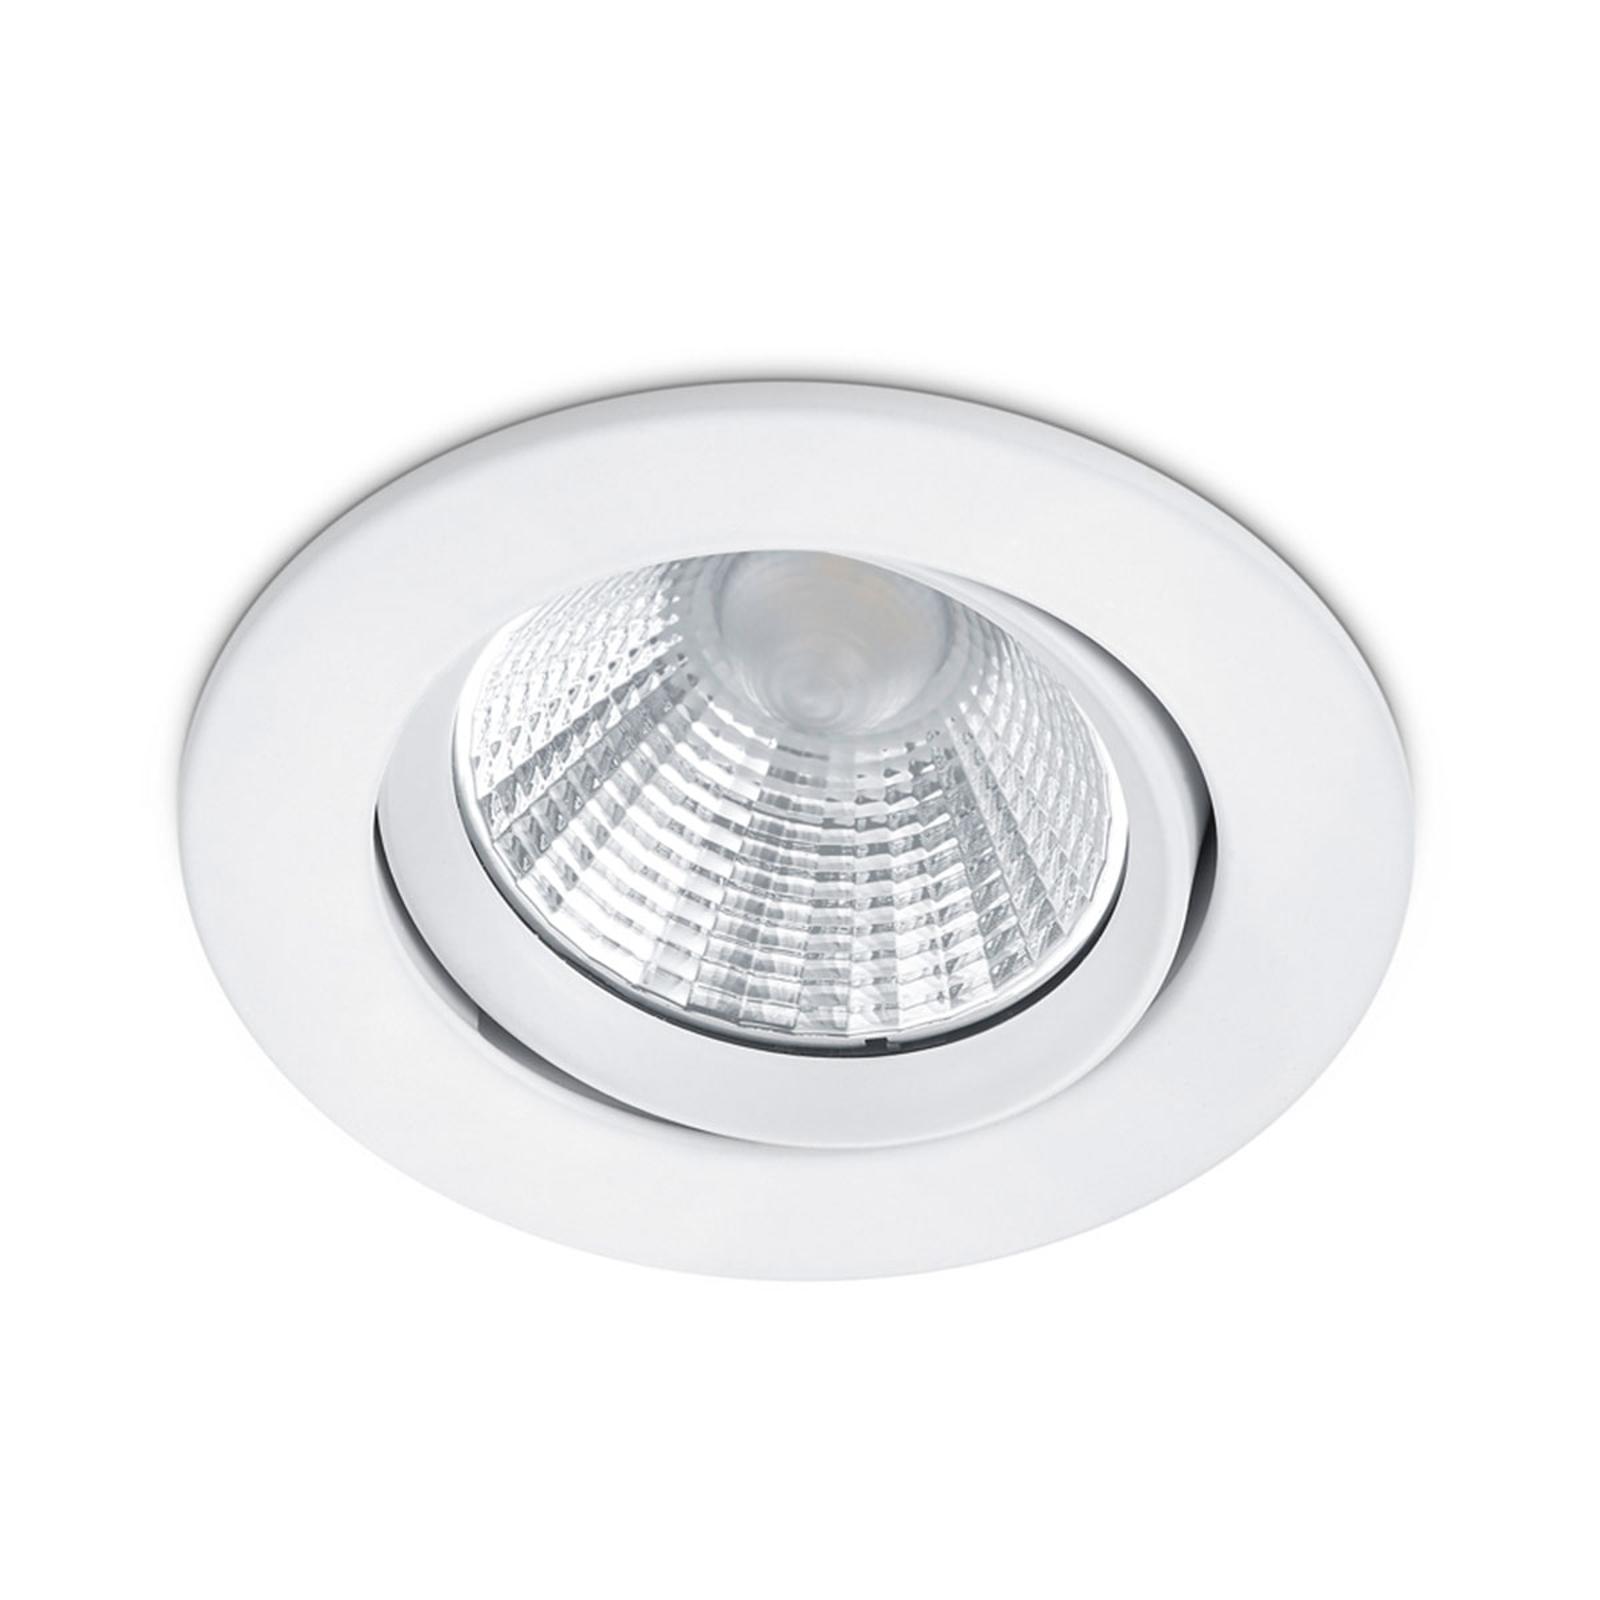 Runder LED-Einbaustrahler Pamir, dimmbar kaufen